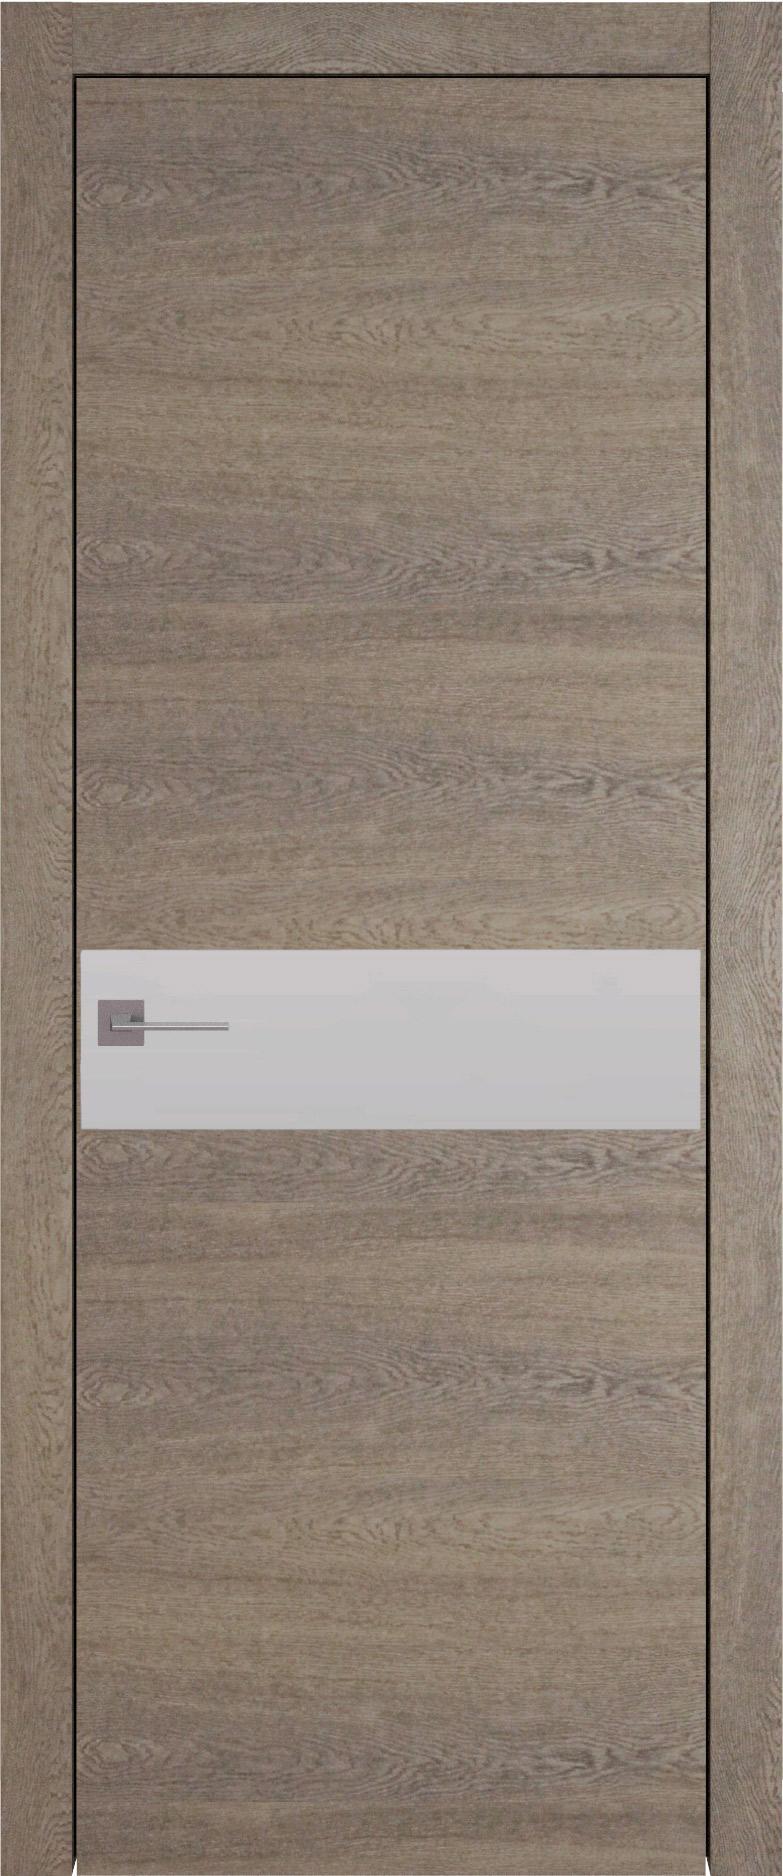 Tivoli И-4 цвет - Дуб антик Без стекла (ДГ)